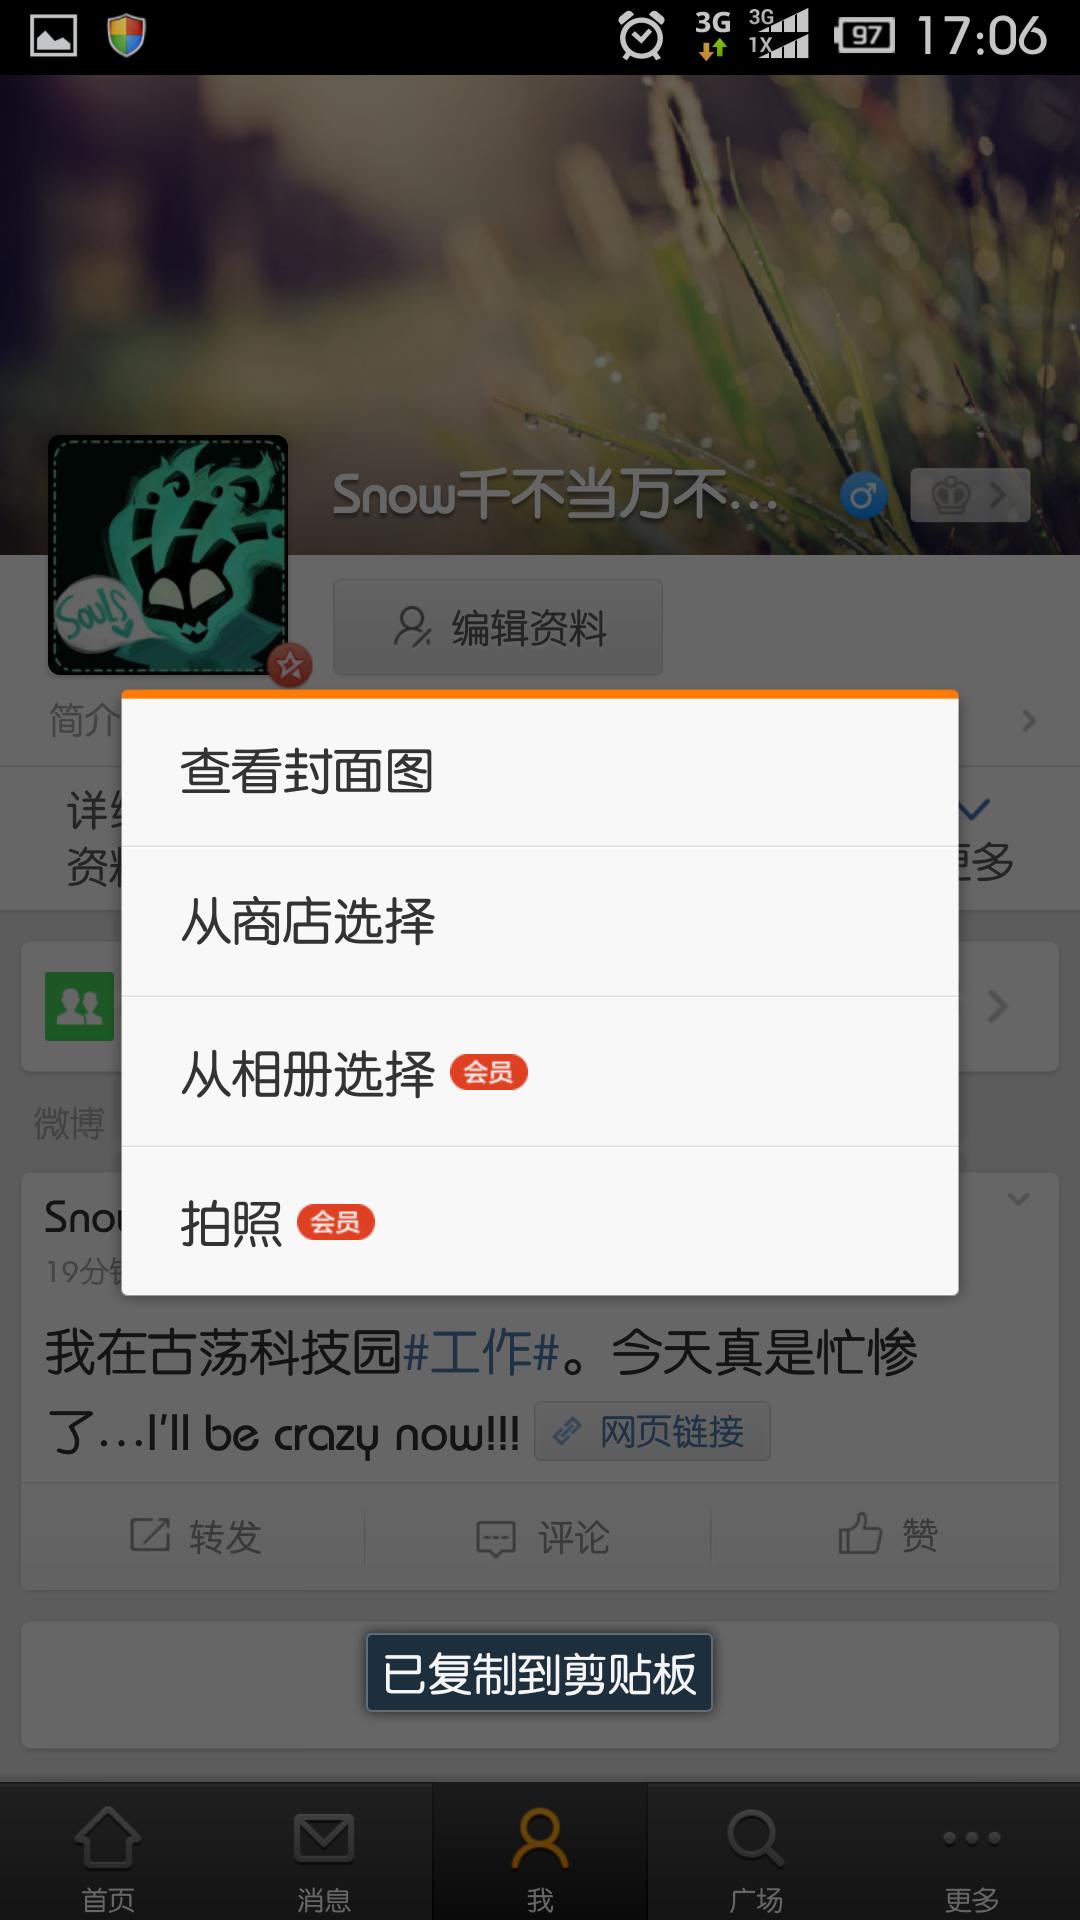 Screenshot_2013-11-05-17-06-32.png